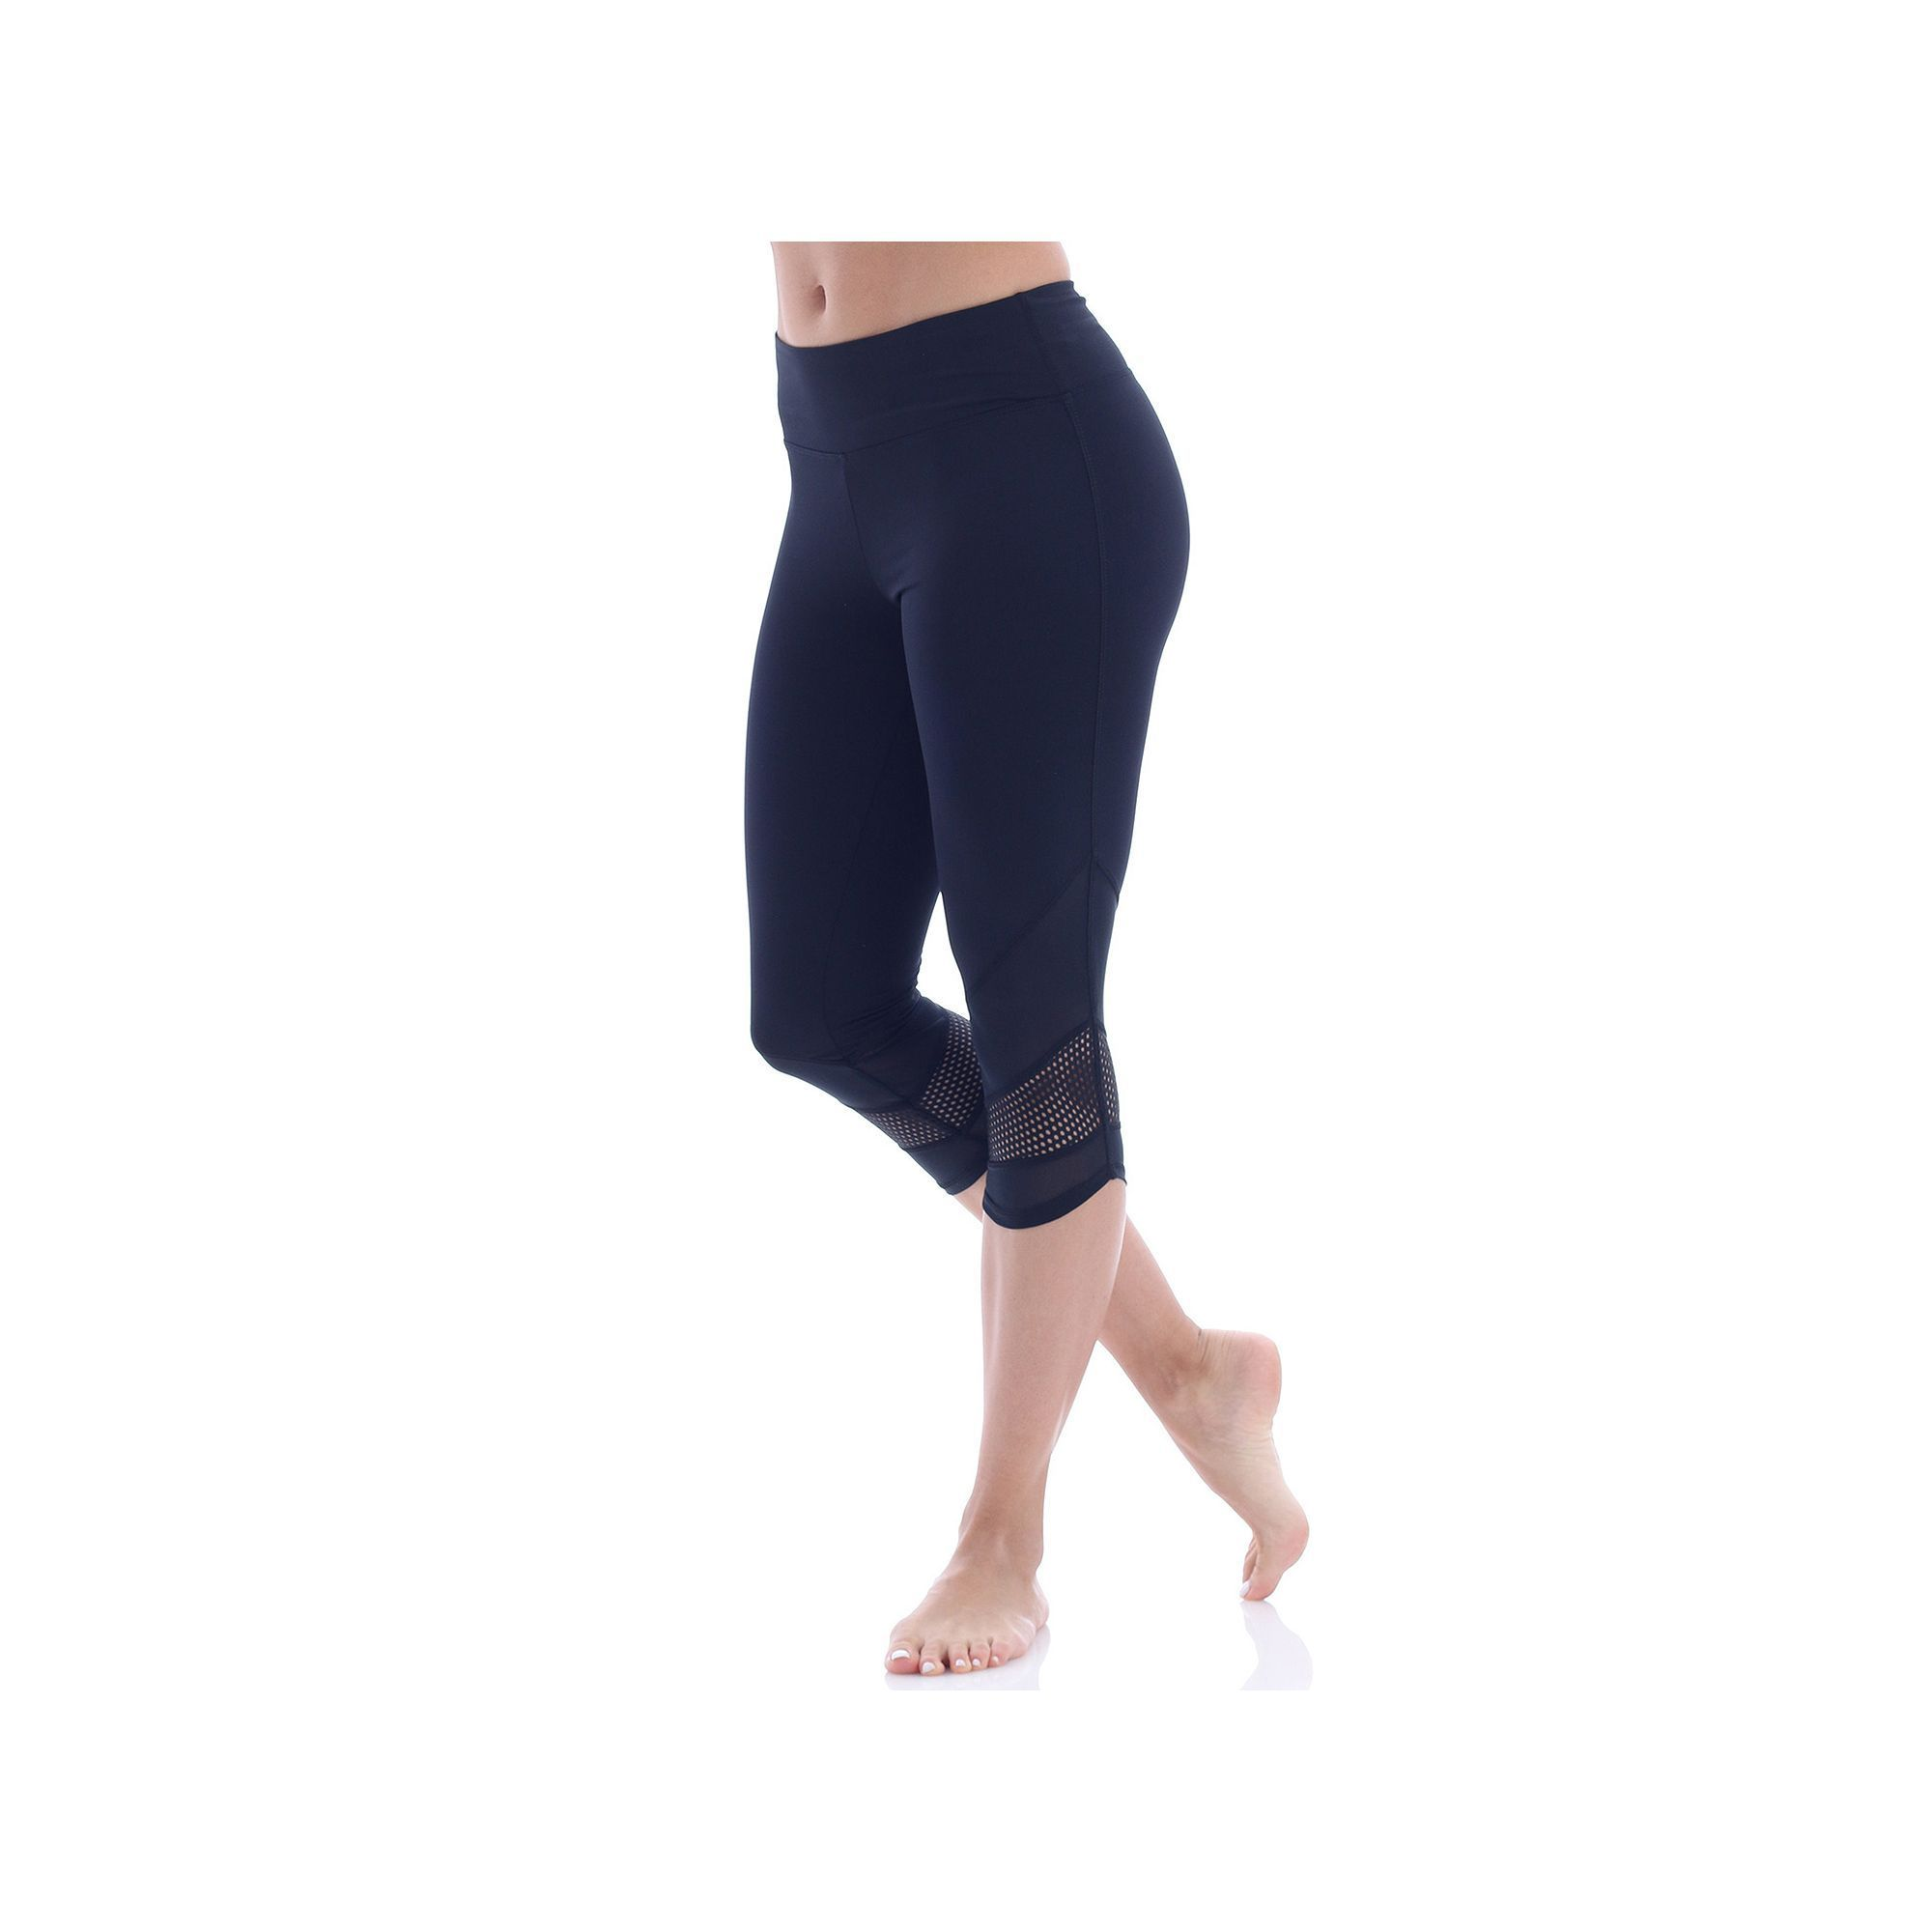 d46d38326565a Women's Balance Collection Ava Edged Out Capri Leggings, Size: Medium, Black